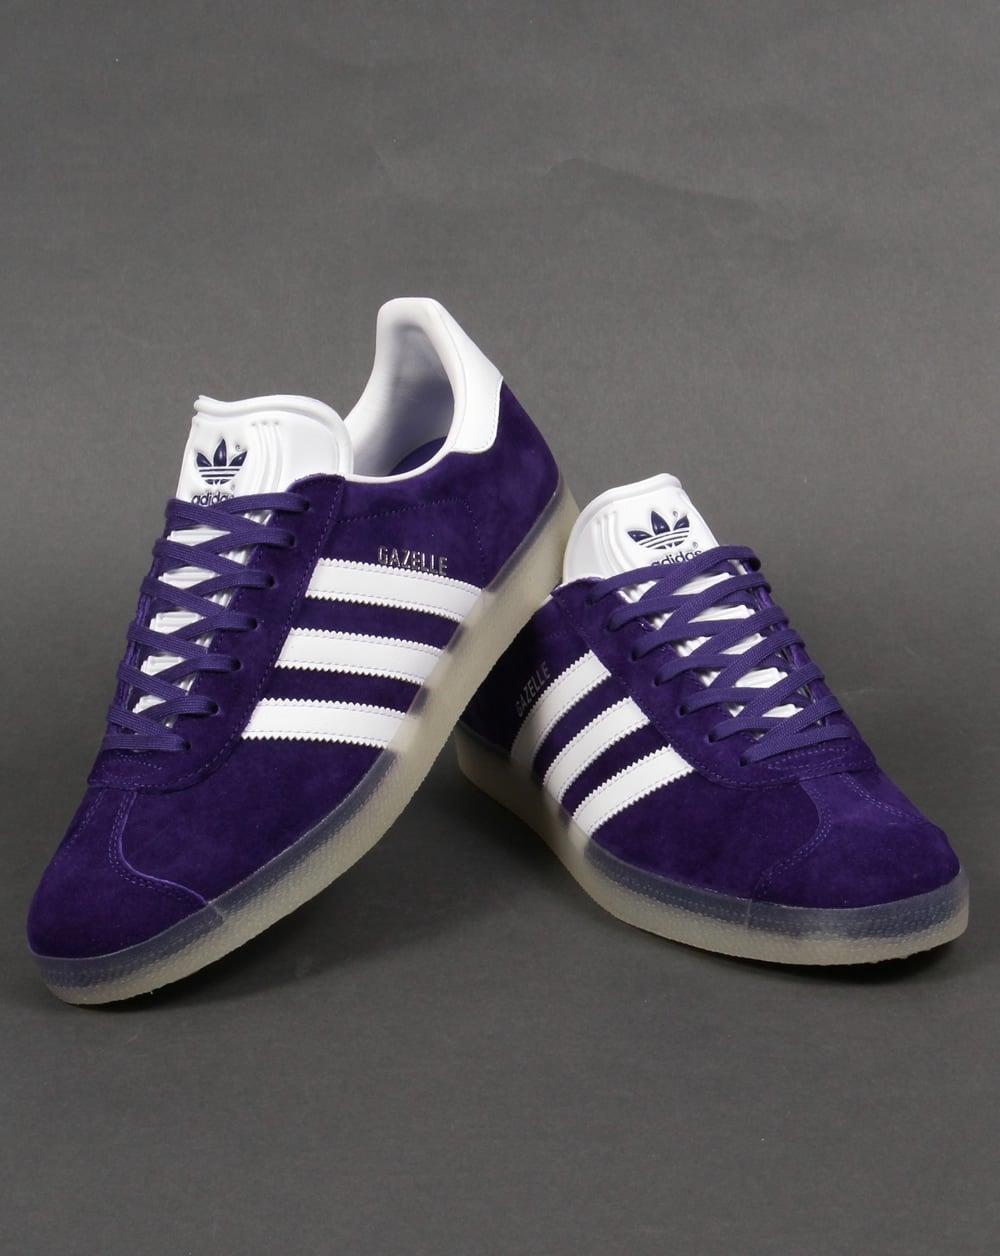 Adidas Gazelle Trainers Solid Grey Red Originals Shoes: Adidas Gazelle, Classic, Trainers, Footwear, Originals